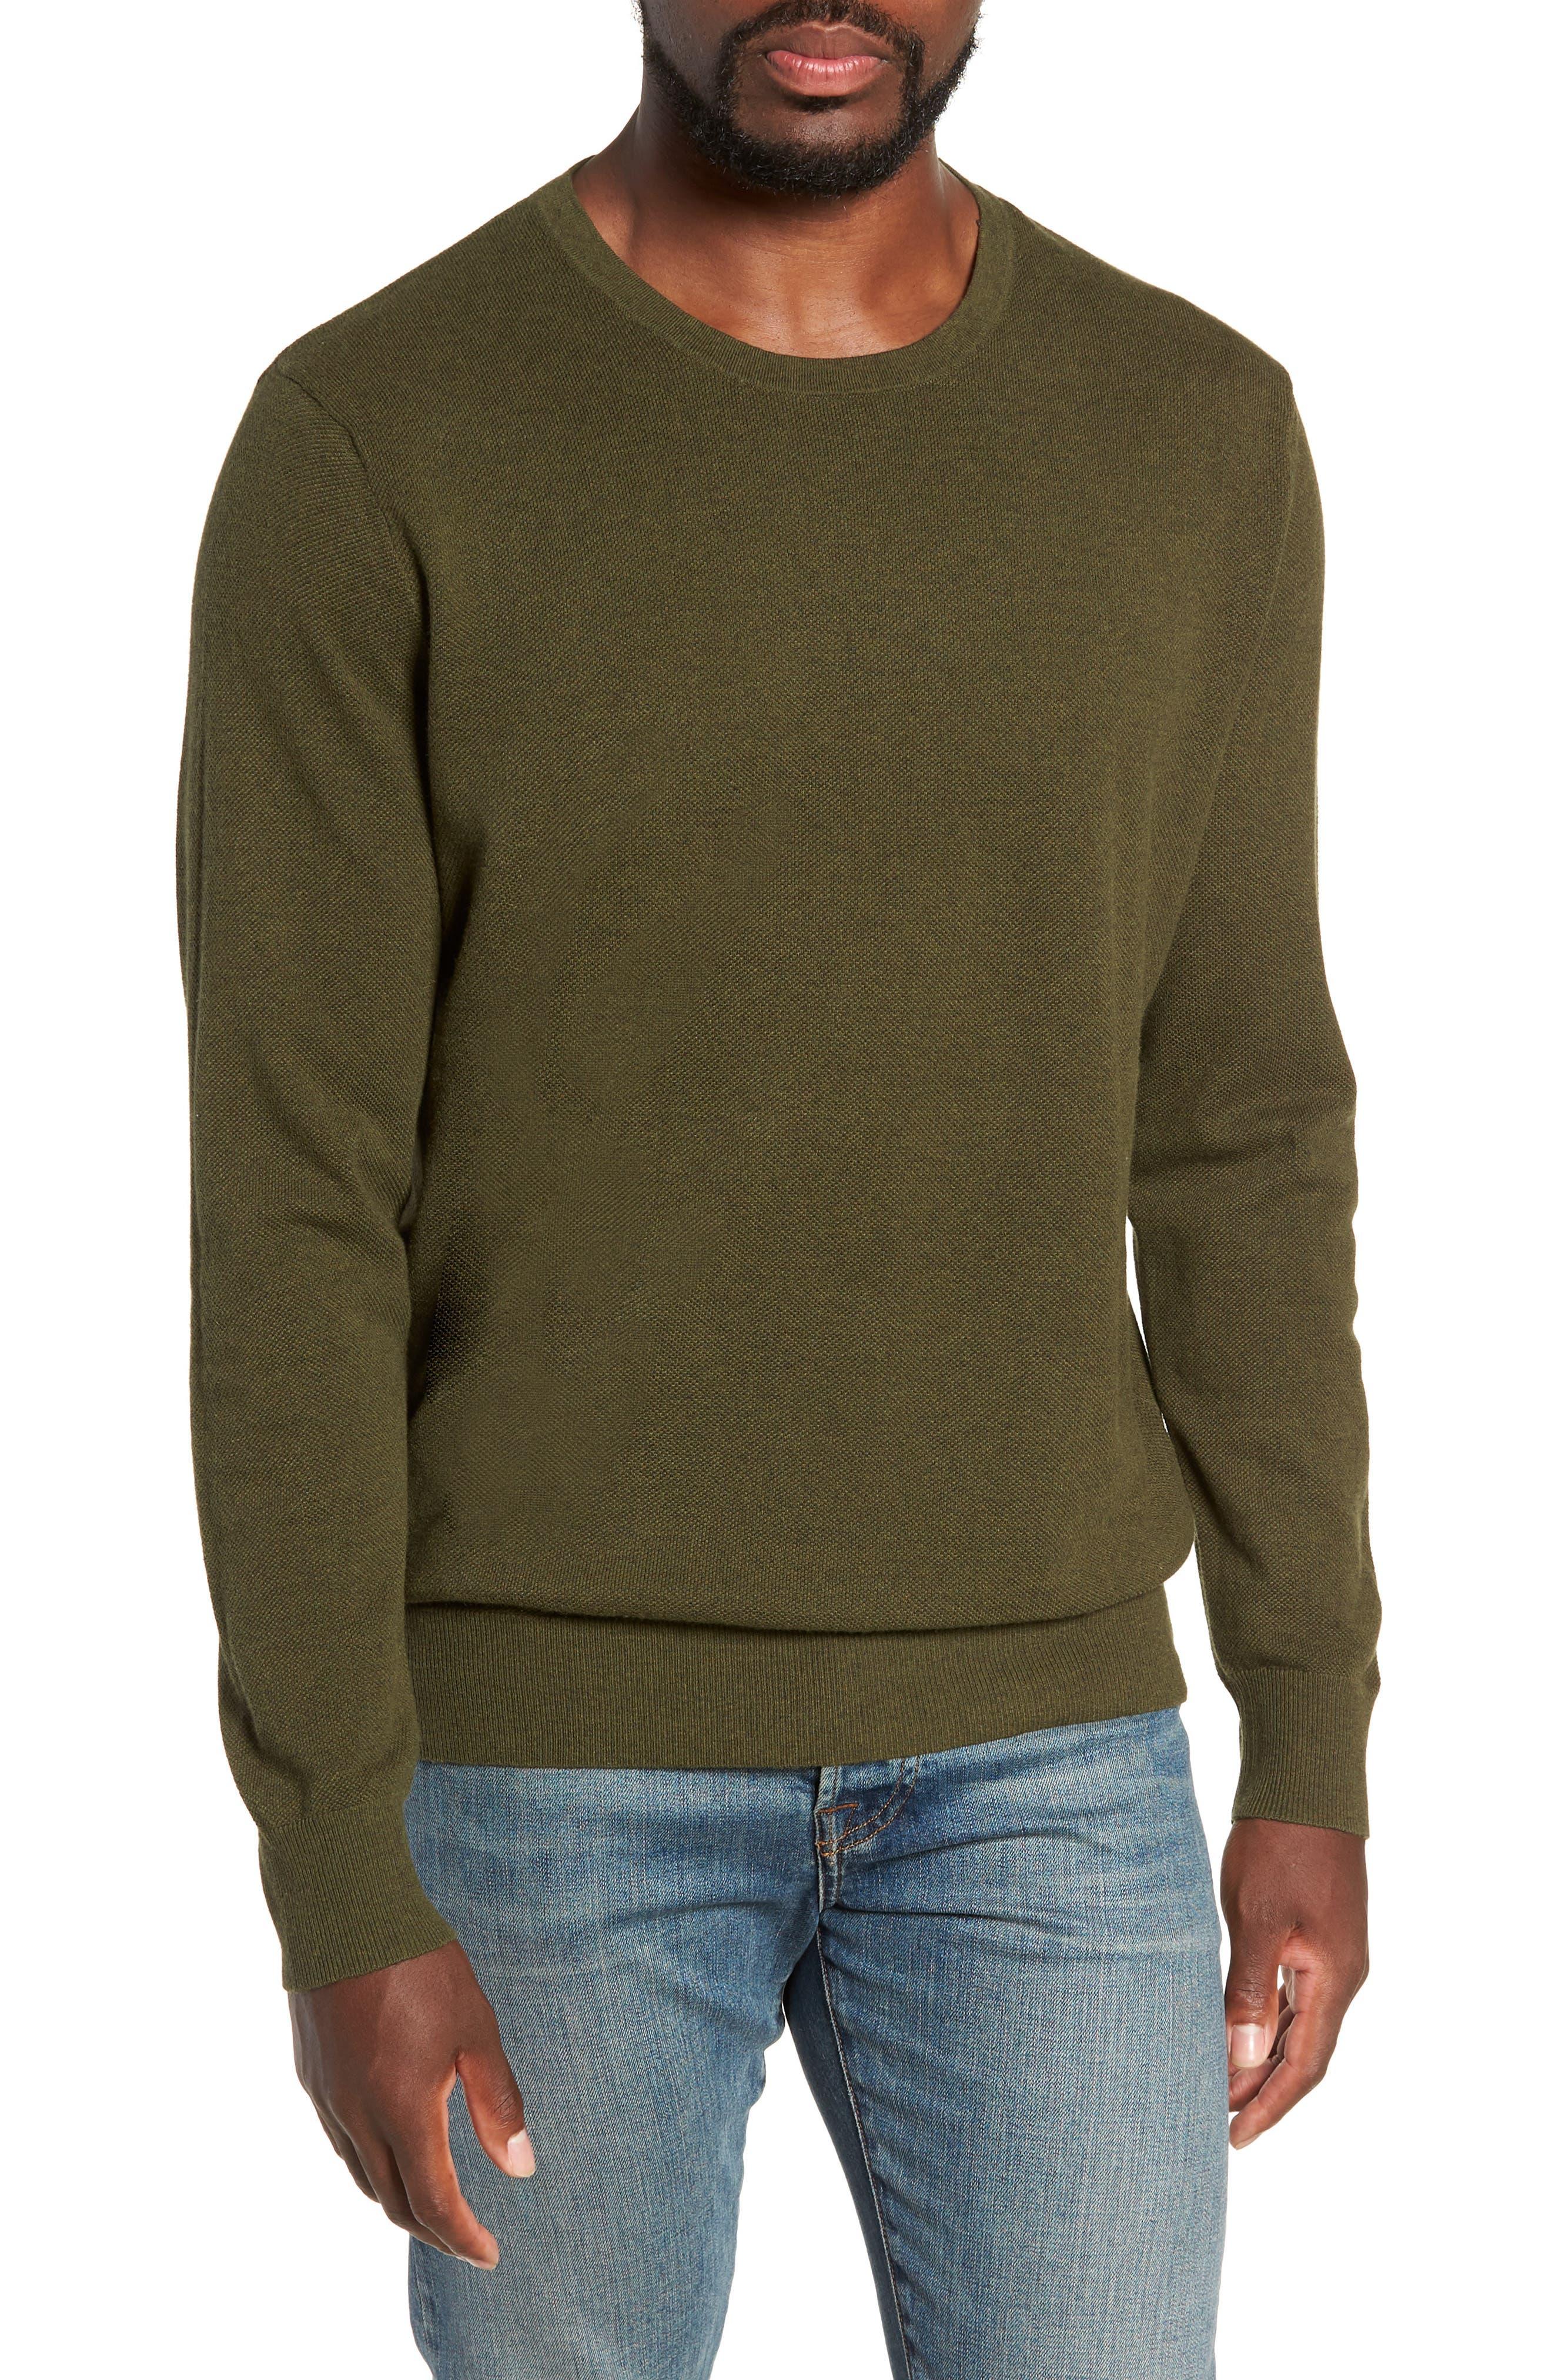 J.crew Cotton & Cashmere Pique Crewneck Sweater, Green